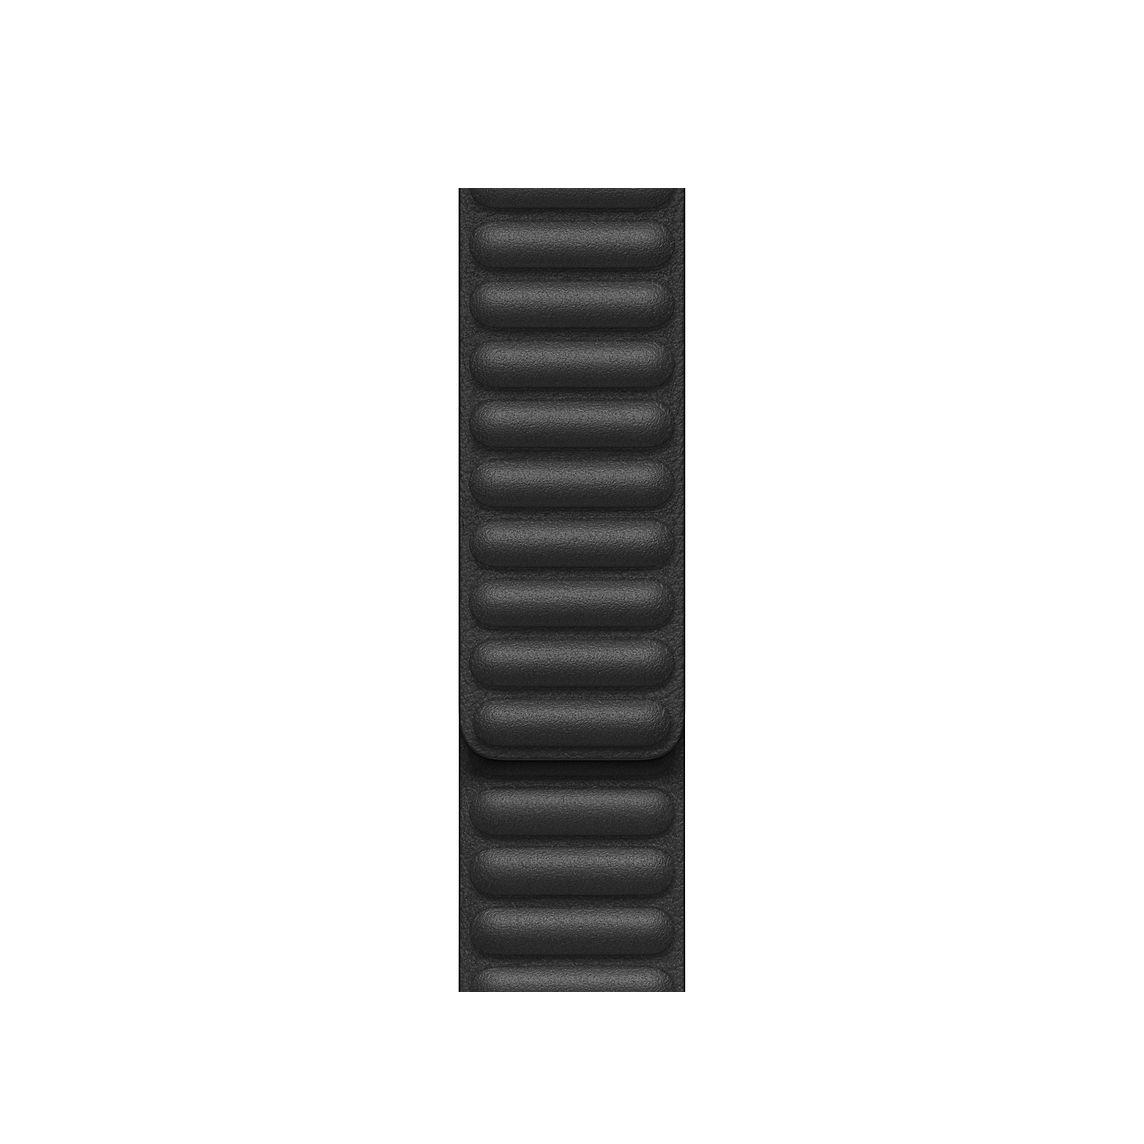 Apple 애플워치 3/6/SE Leather Link 밴드 Small (38/40mm 호환 가능), Black(MY9A2FE/A), 1개